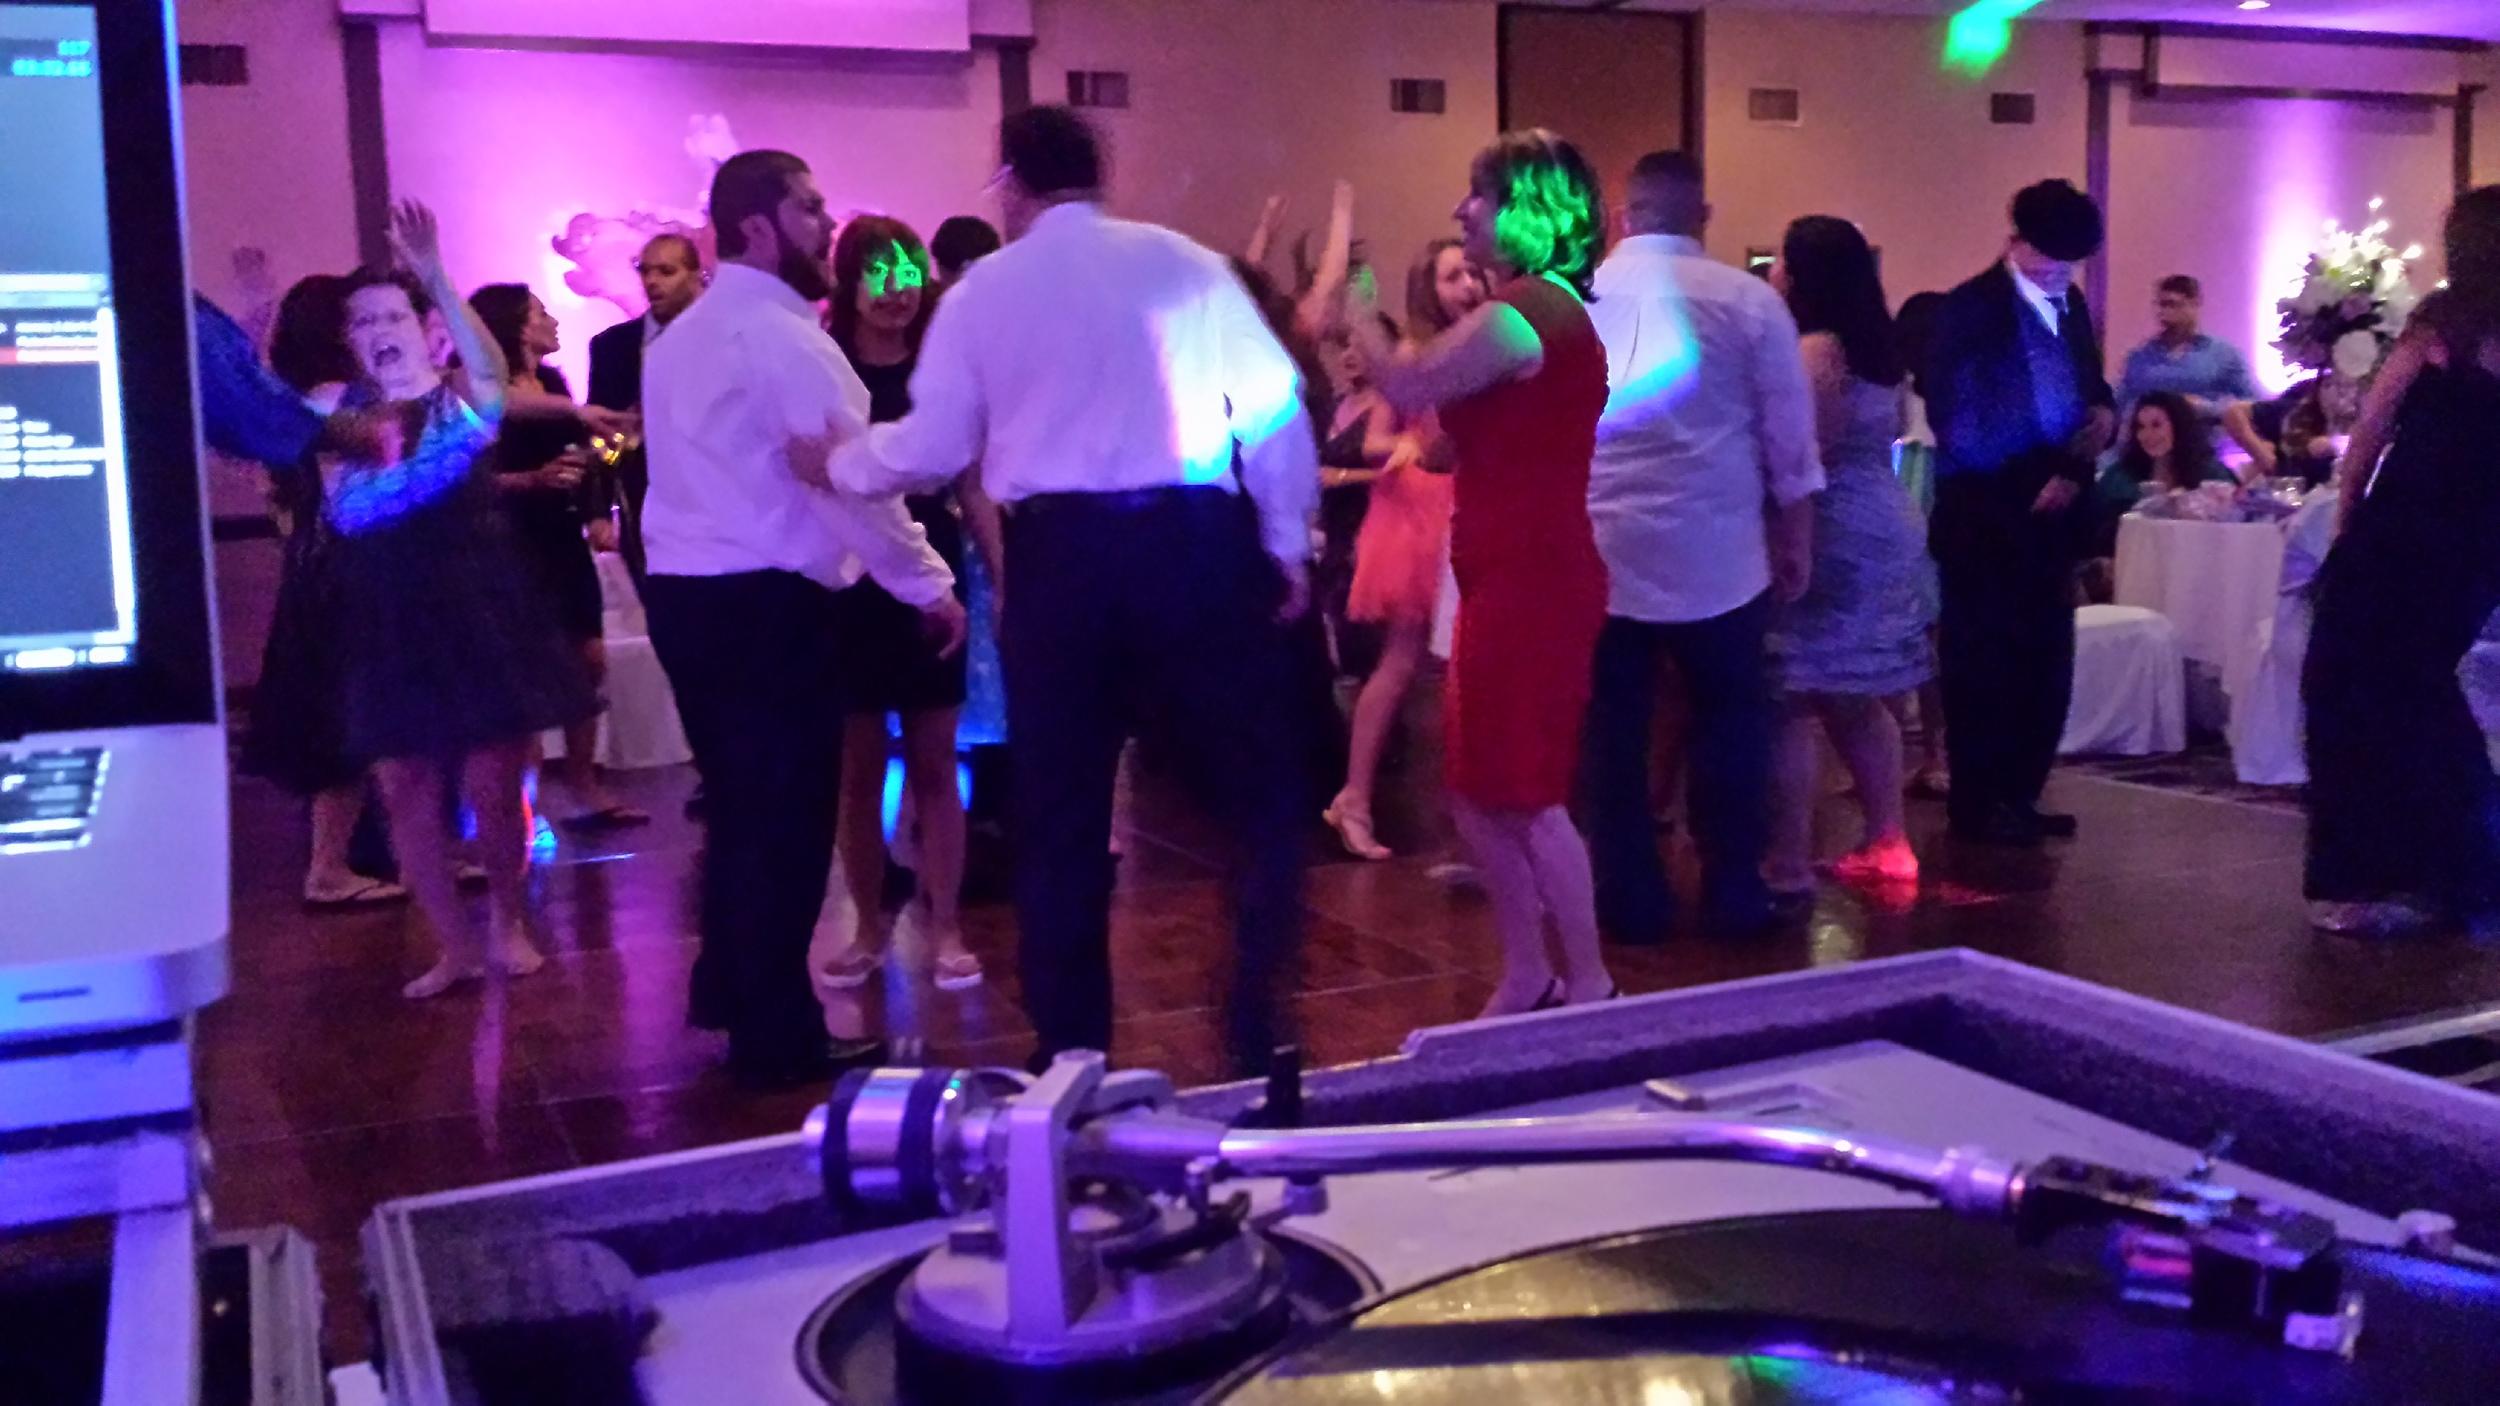 Wedding Event - Temecula CA